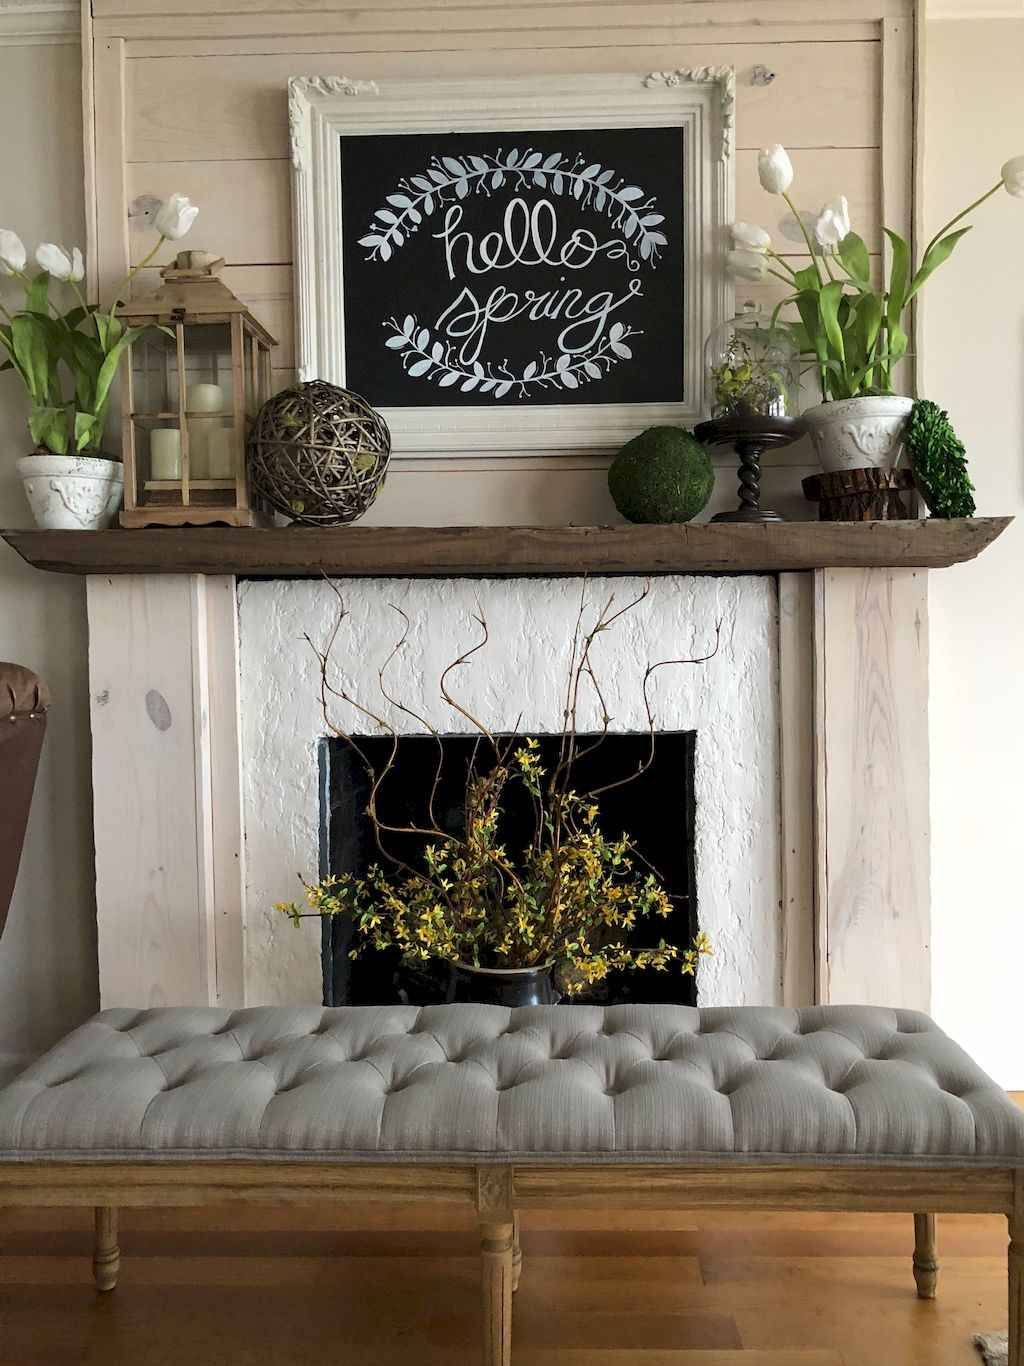 mantel decor for spring